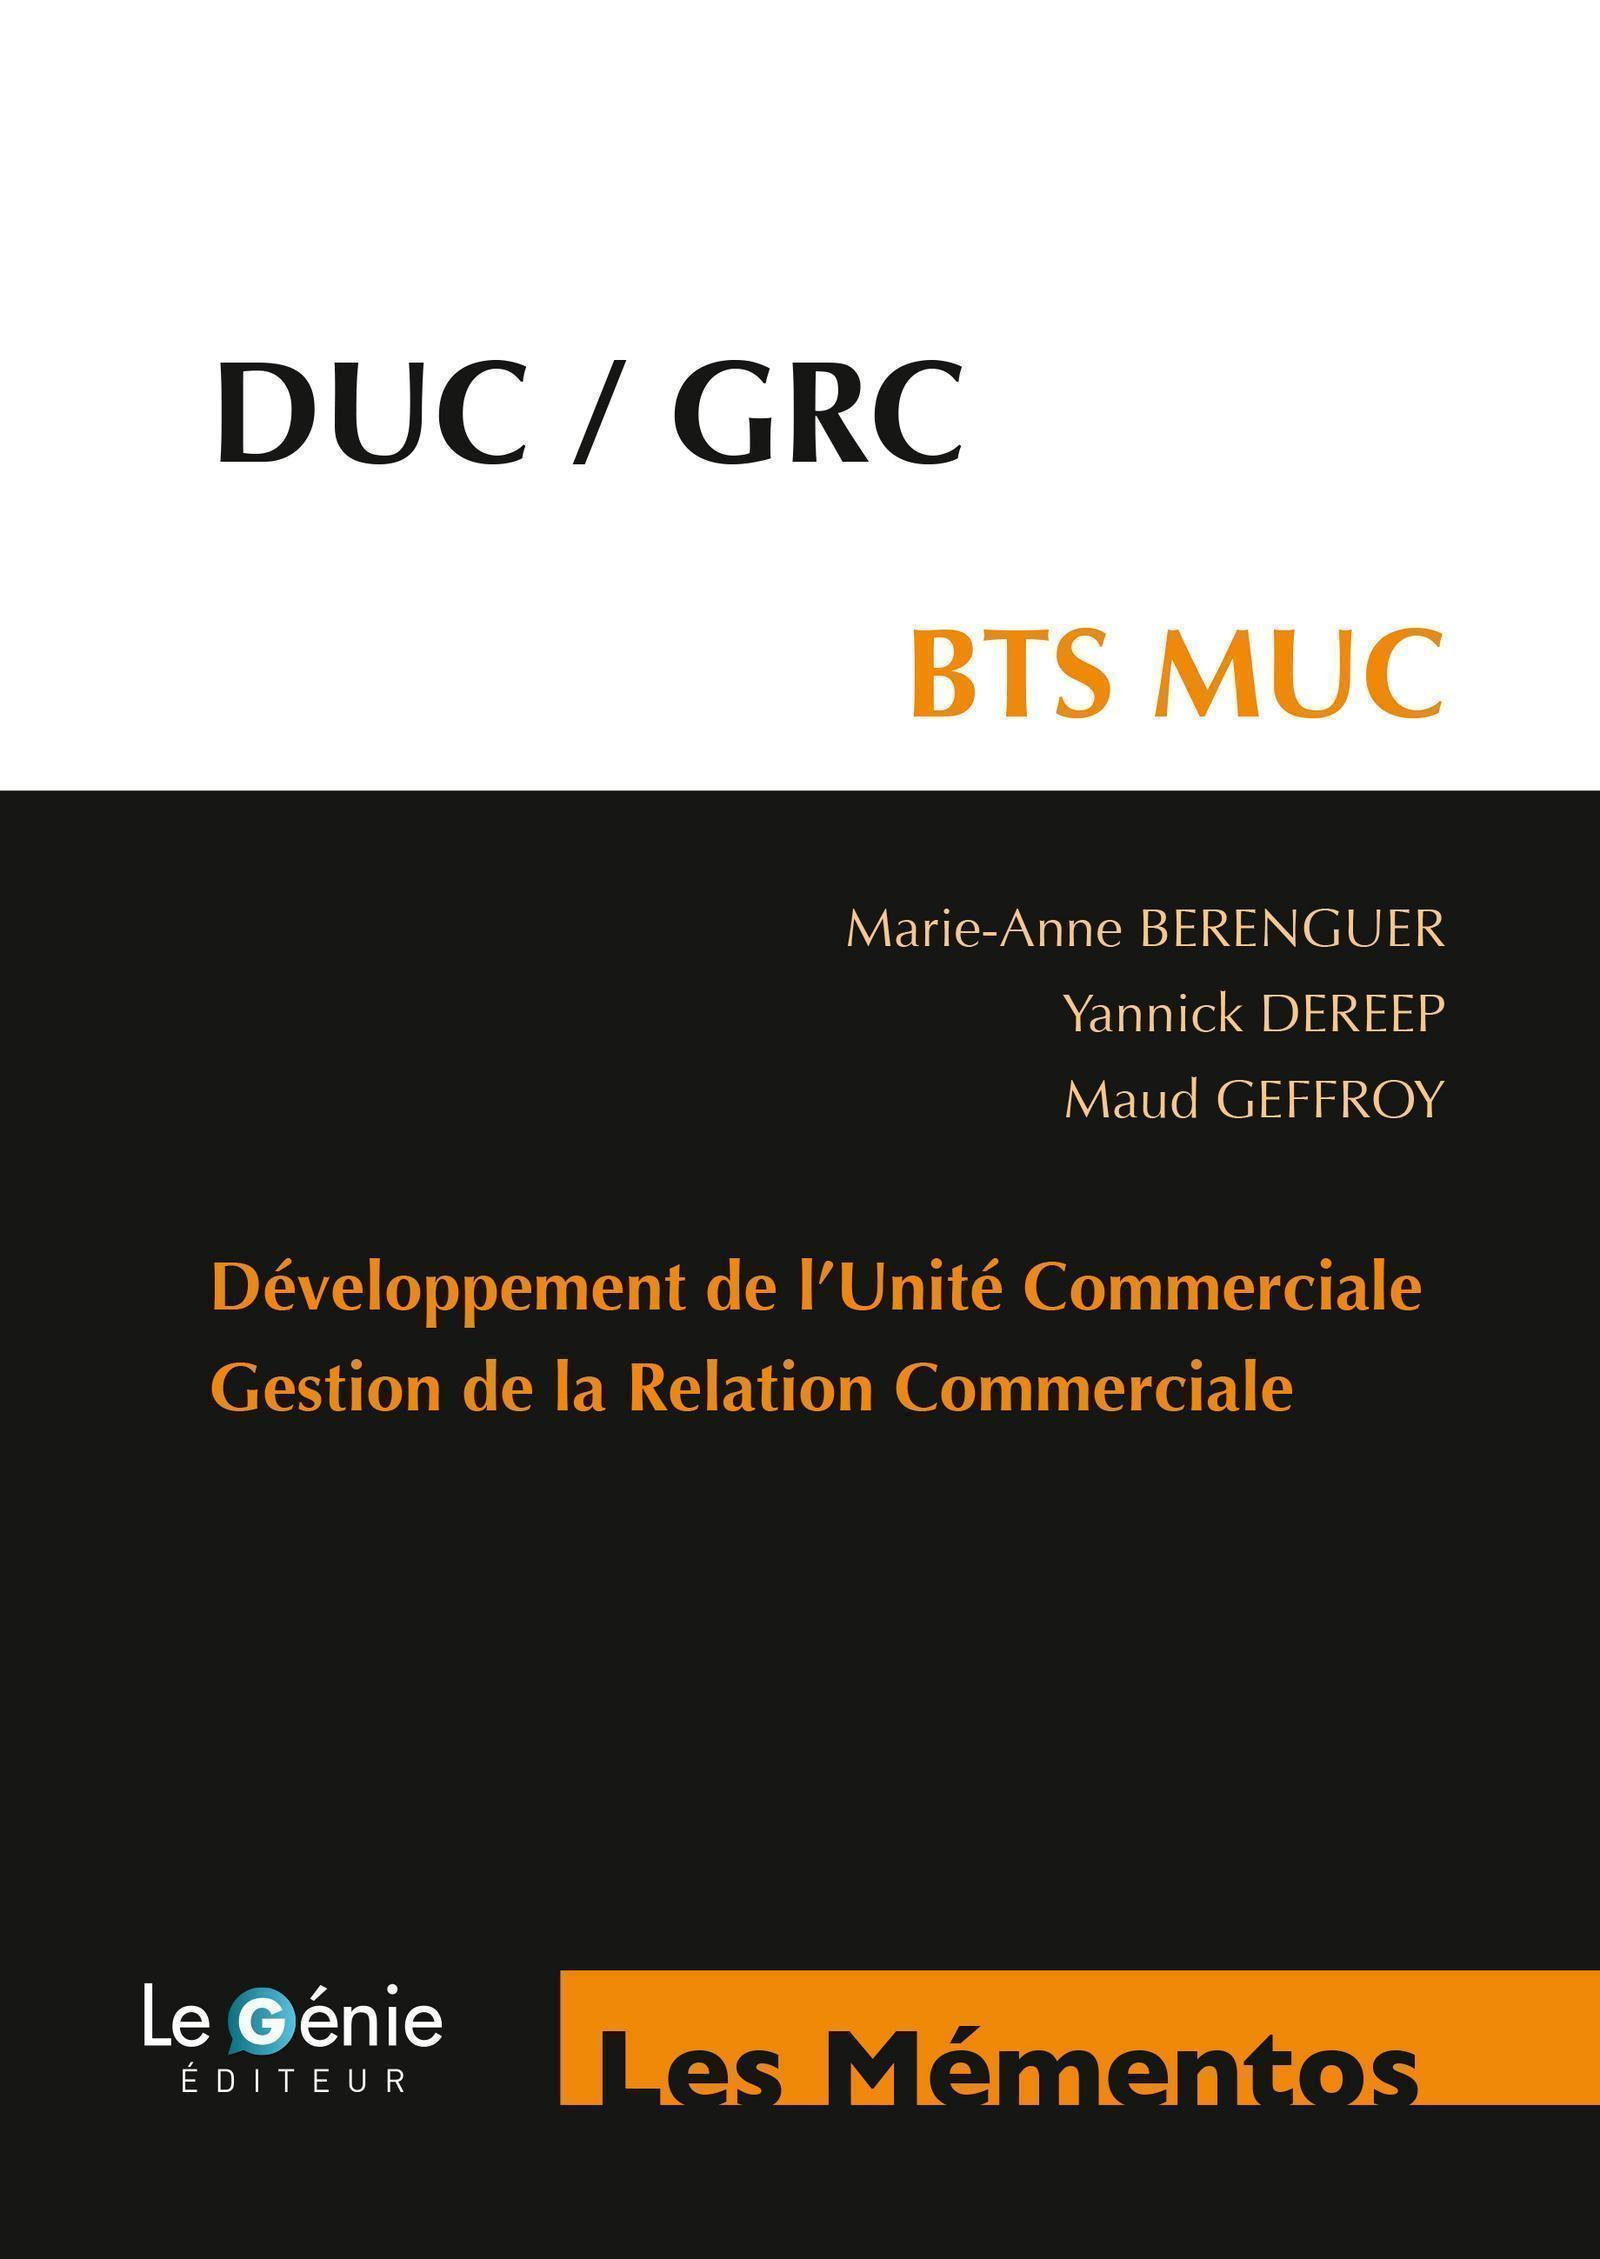 DUC-GRC BTS MUC